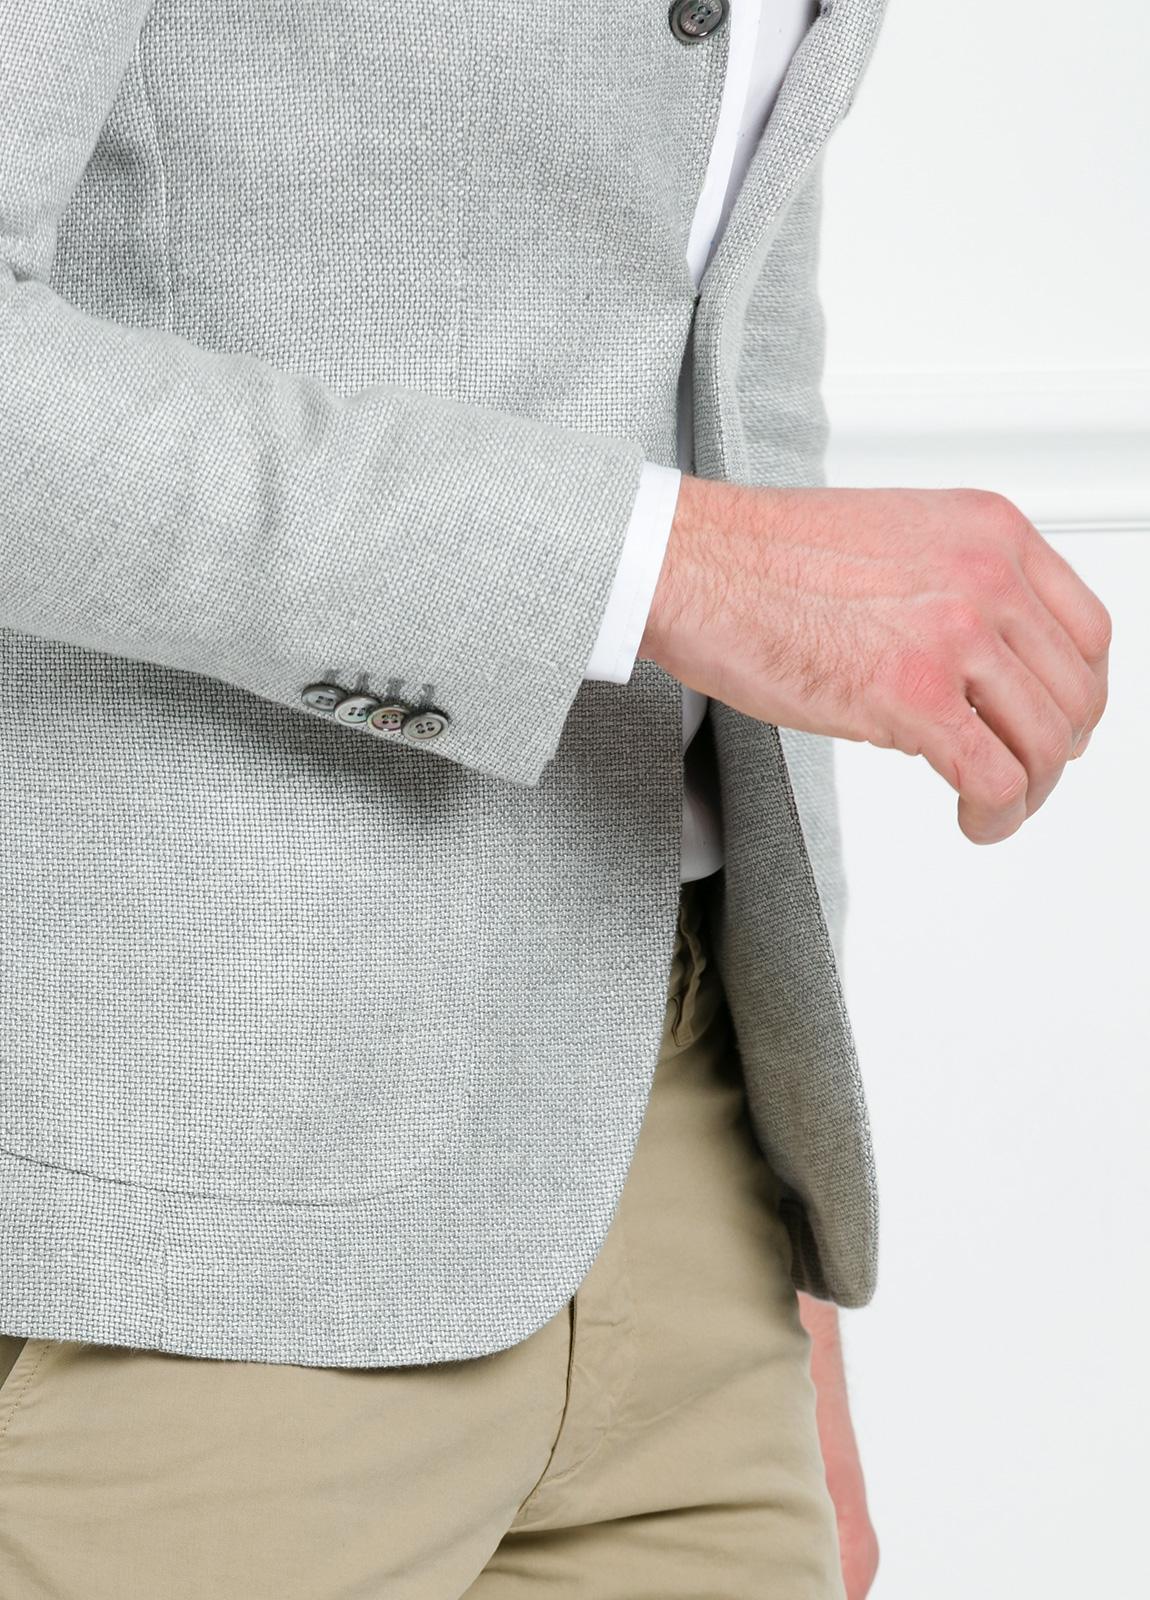 Americana SOFT JACKET Slim Fit textura color gris. 75% Cáñamo 25% lana. - Ítem2